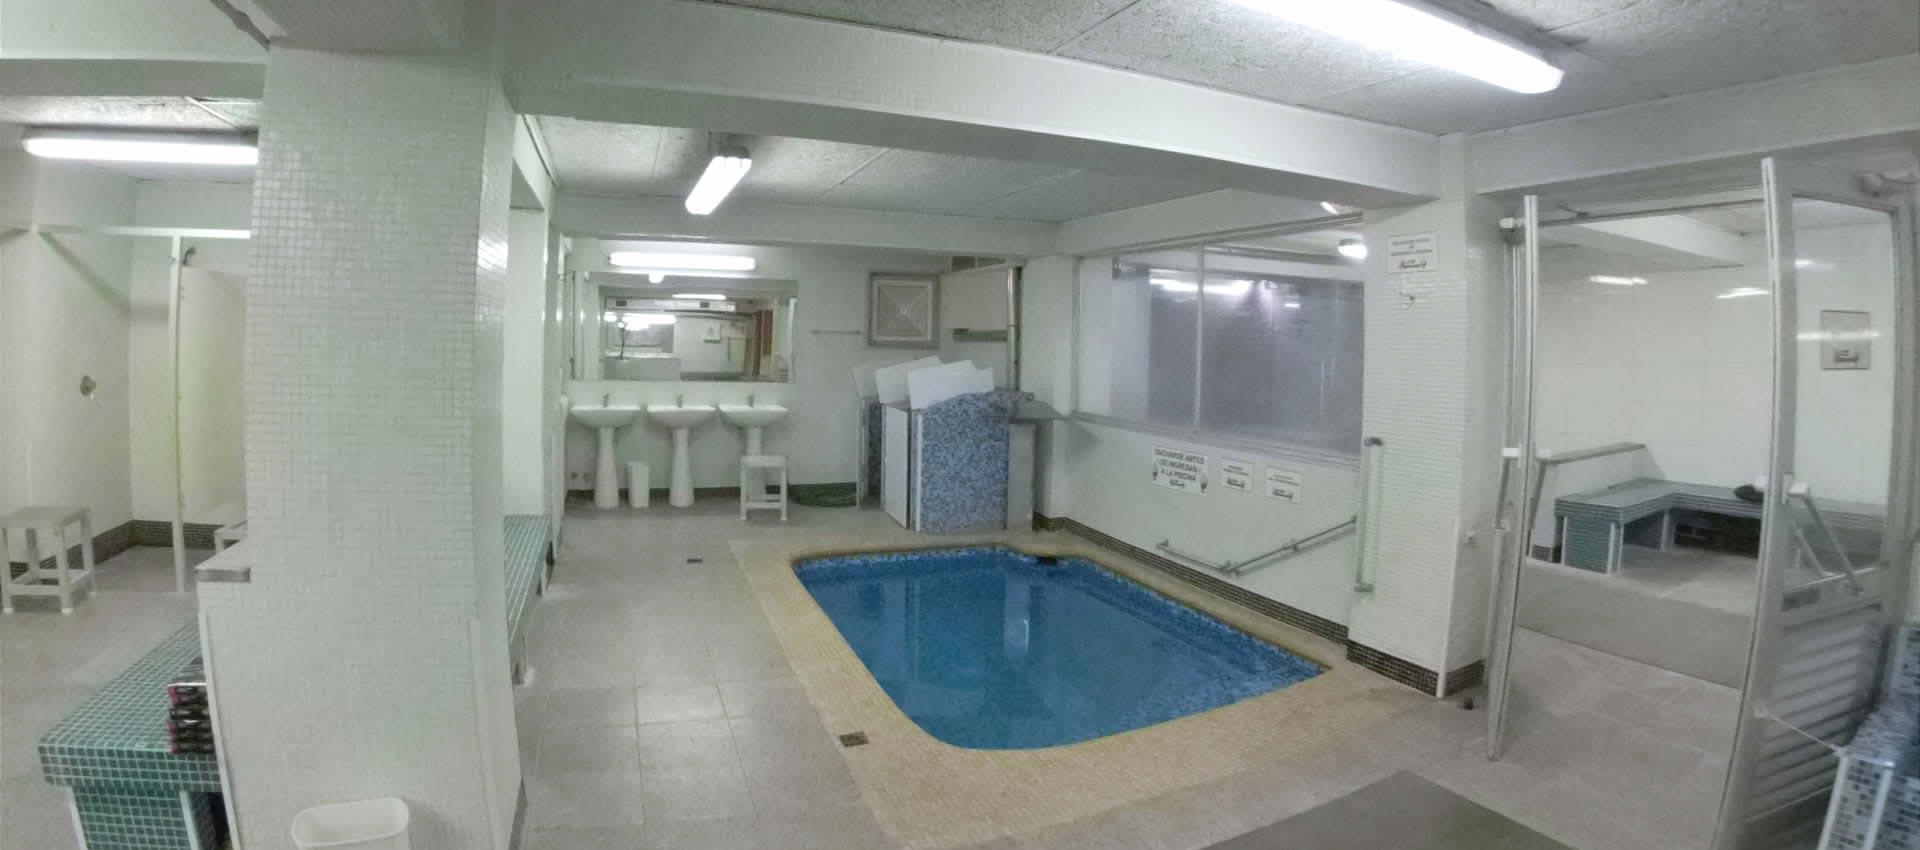 Piscina Baño Turco Sauna